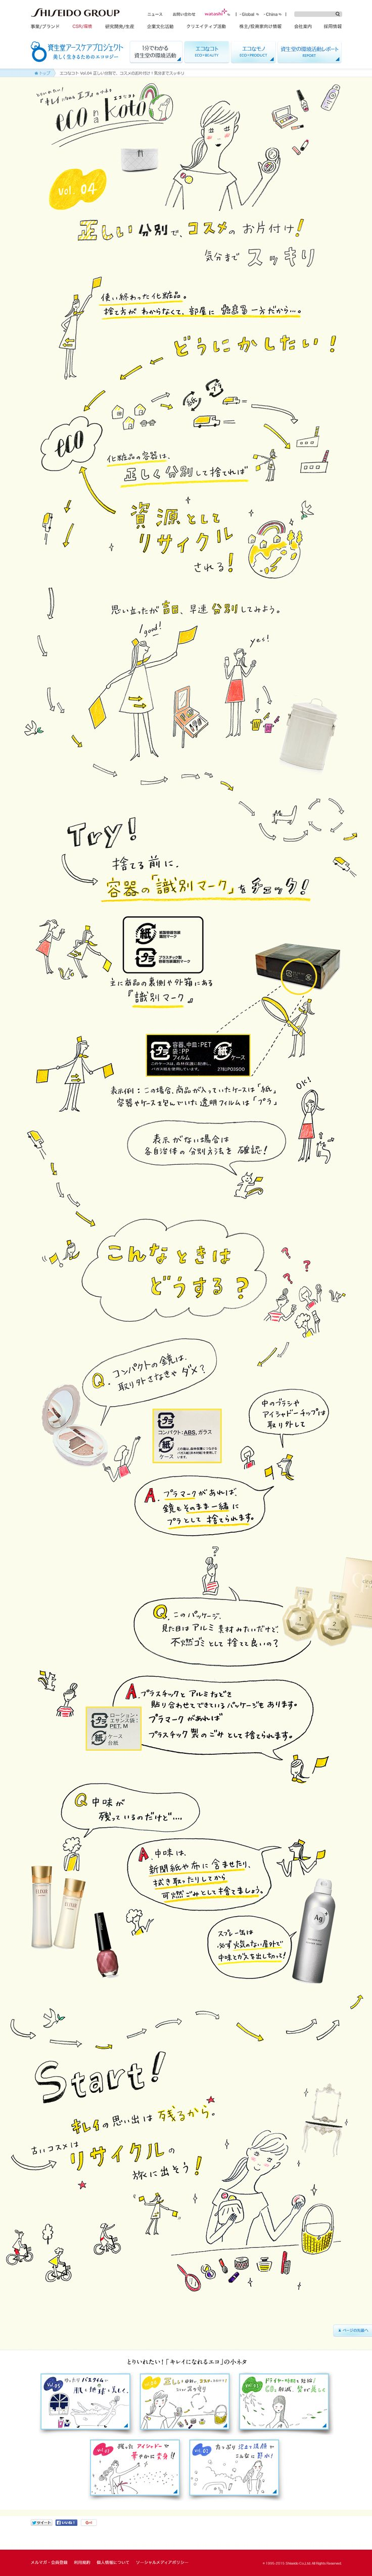 http://www.shiseidogroup.jp/eco/column/detail04/